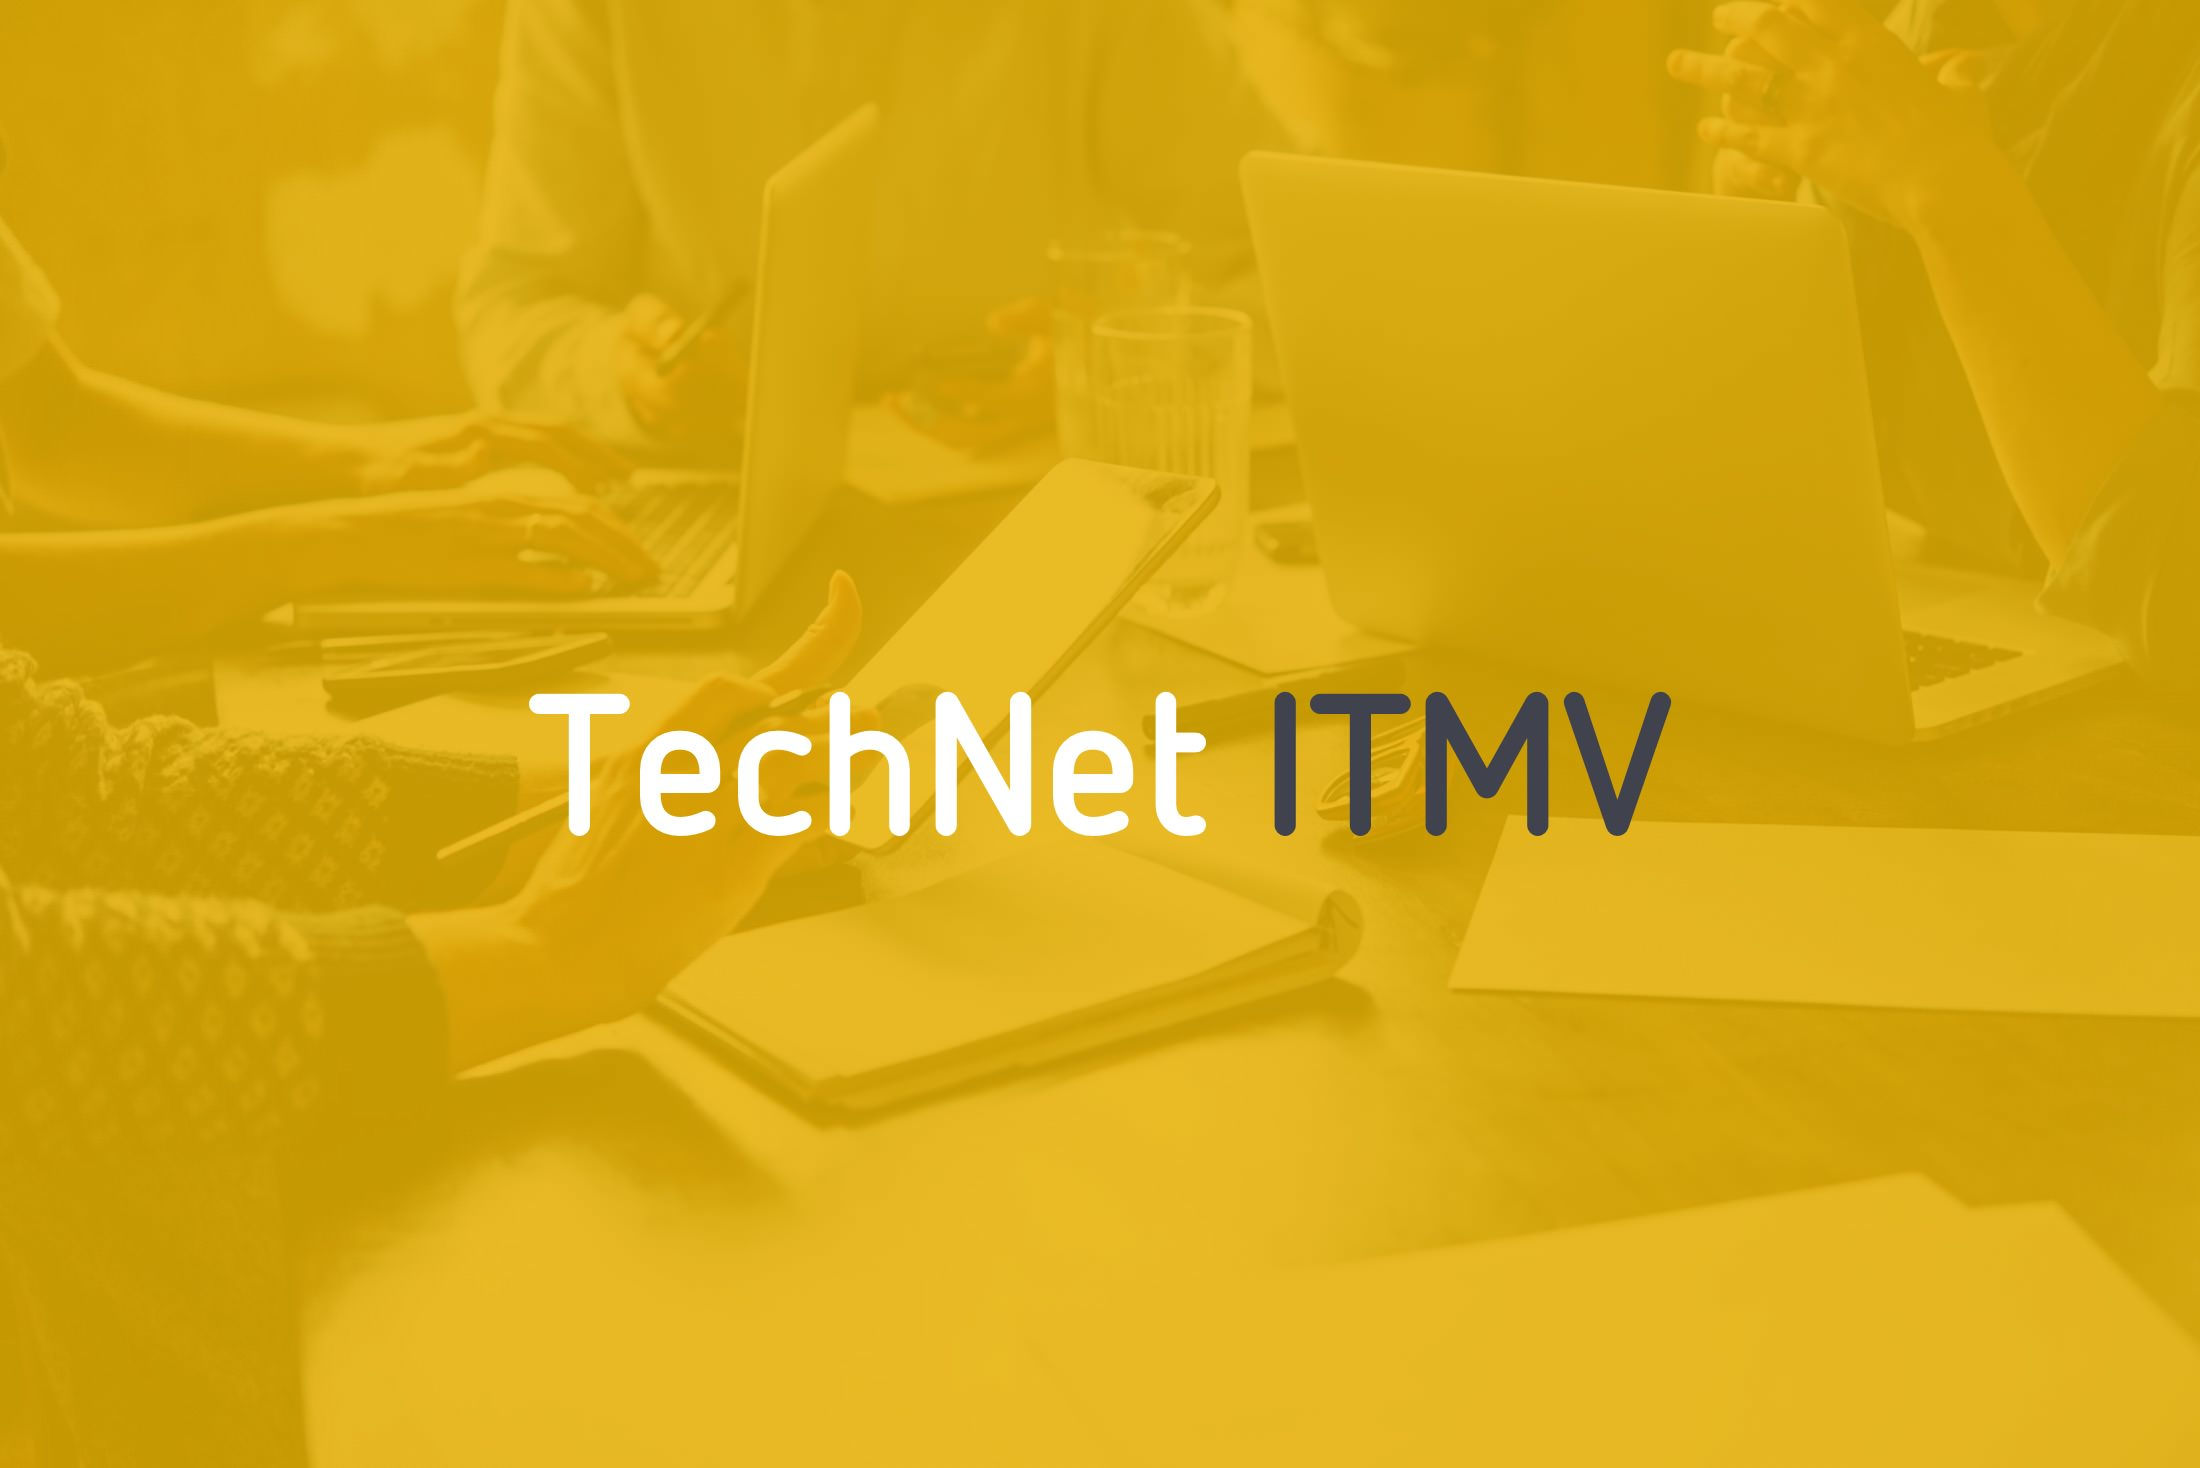 TechNet ITMV » IT Initiative Mecklenburg-Vorpommern e.V.